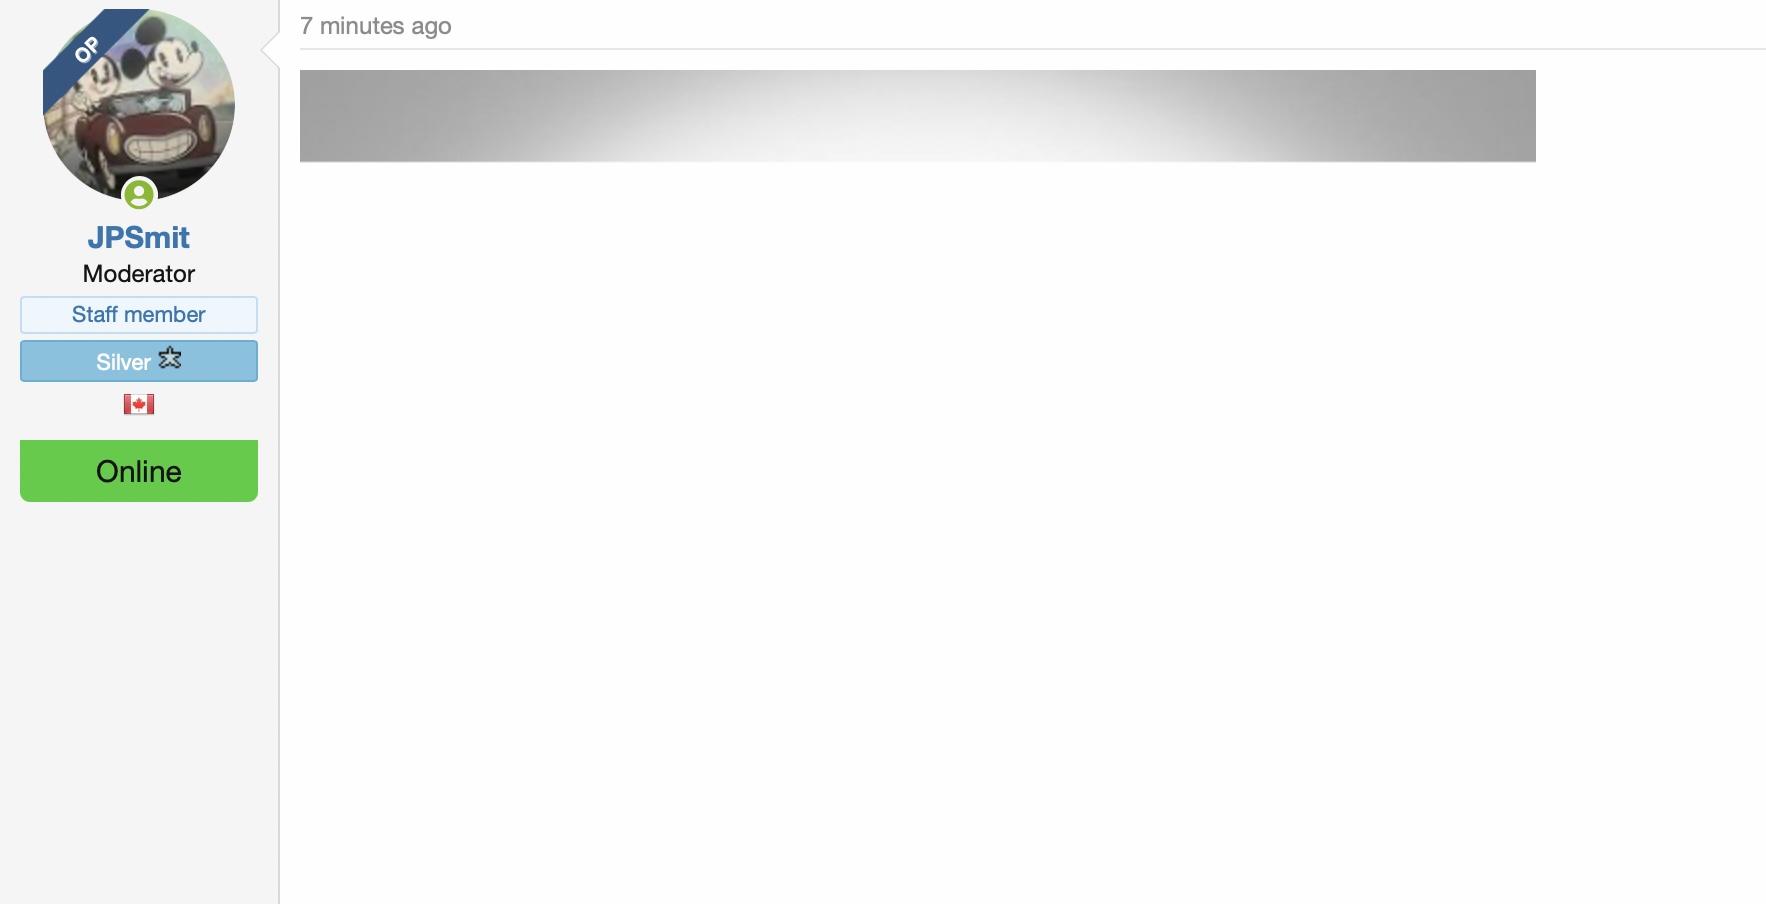 Screen Shot 2021-06-25 at 7.42.46 AM.jpg